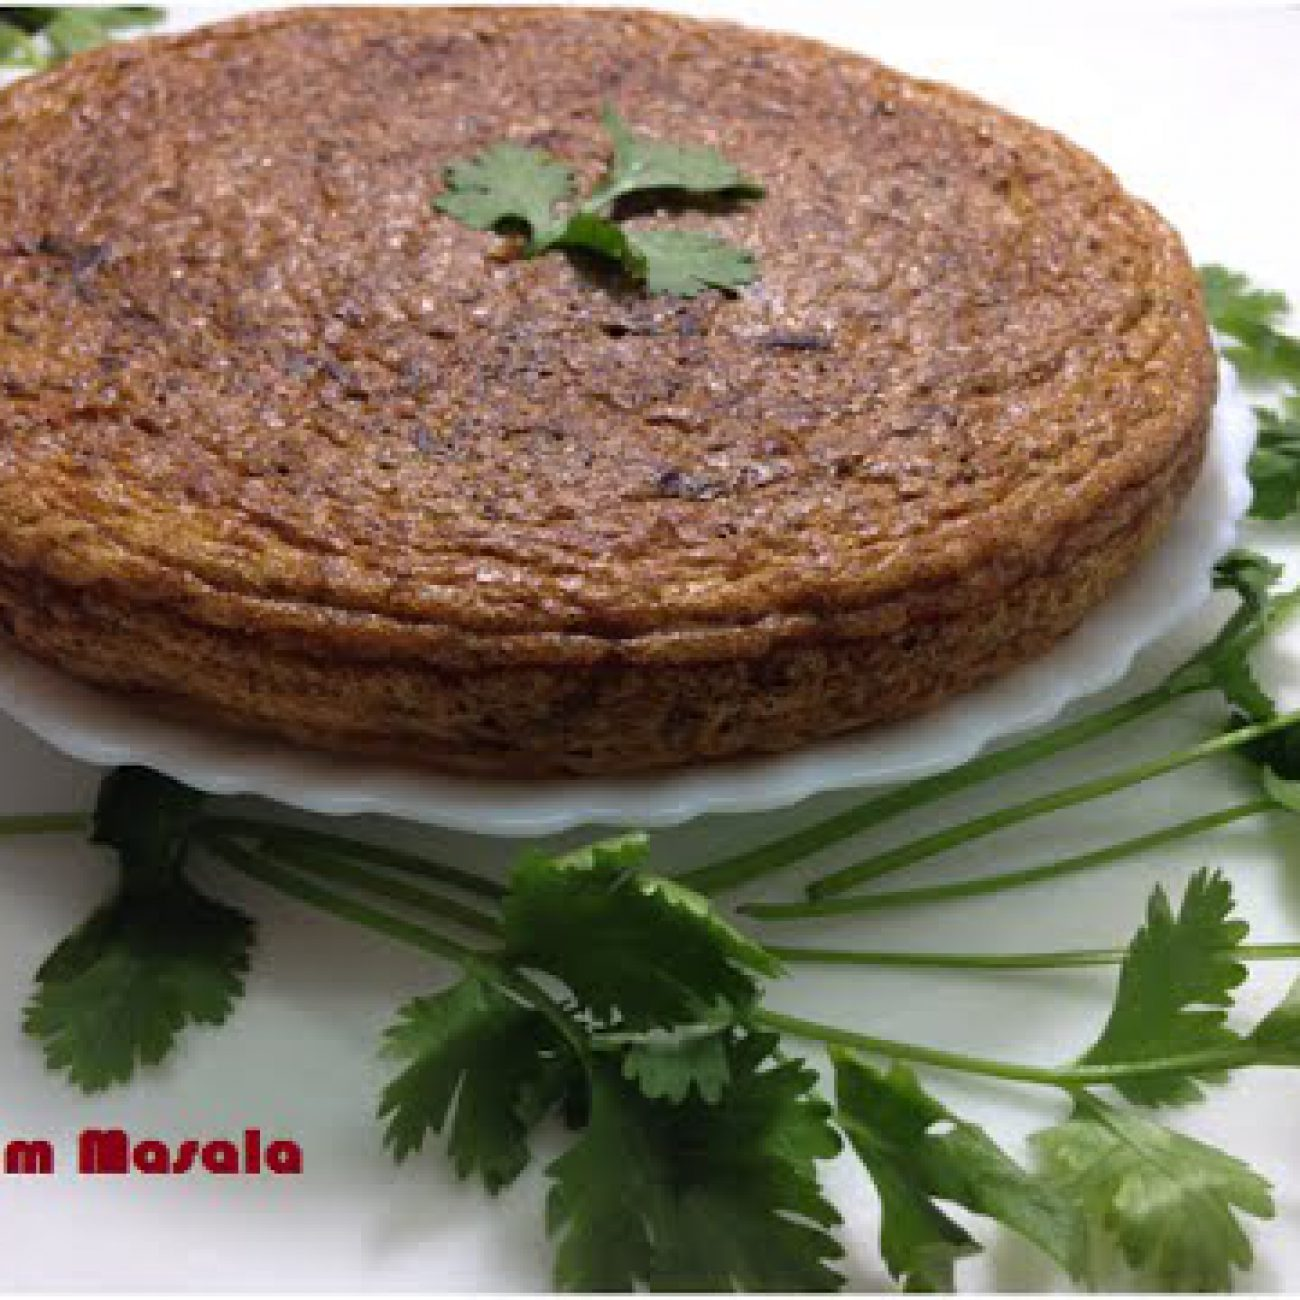 Erachi Pola /  Beef Cake /Snack/ Appetizer / Malabar Iftar Dish for Ramadan